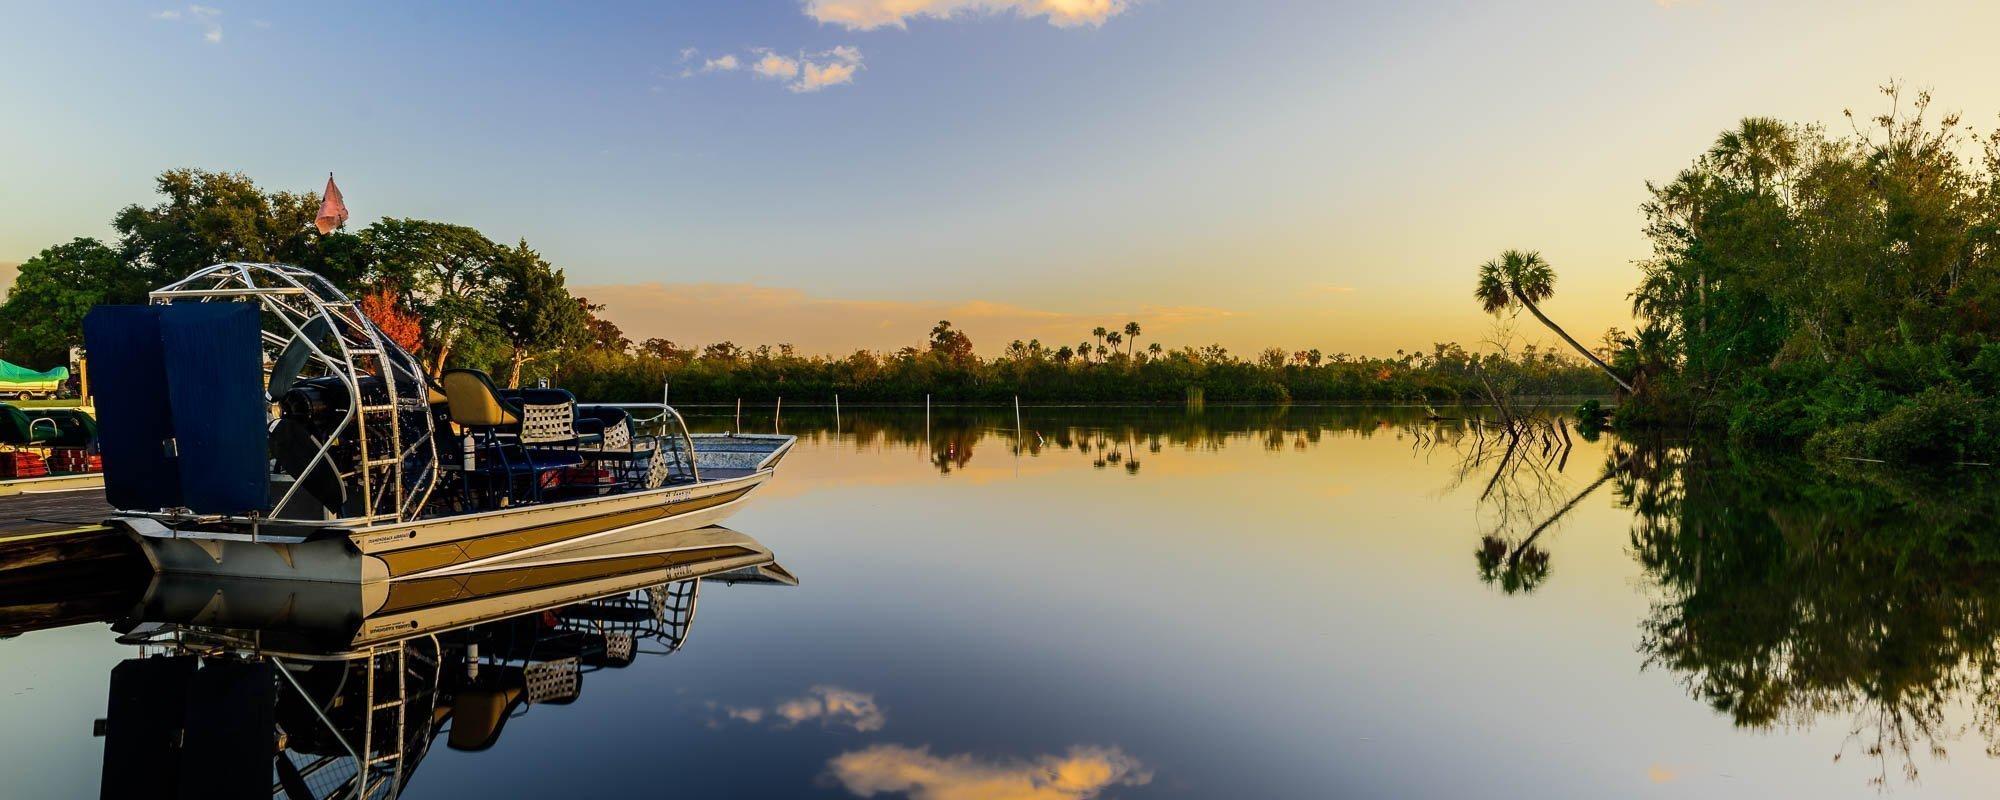 Sunrise over Peace River, FL